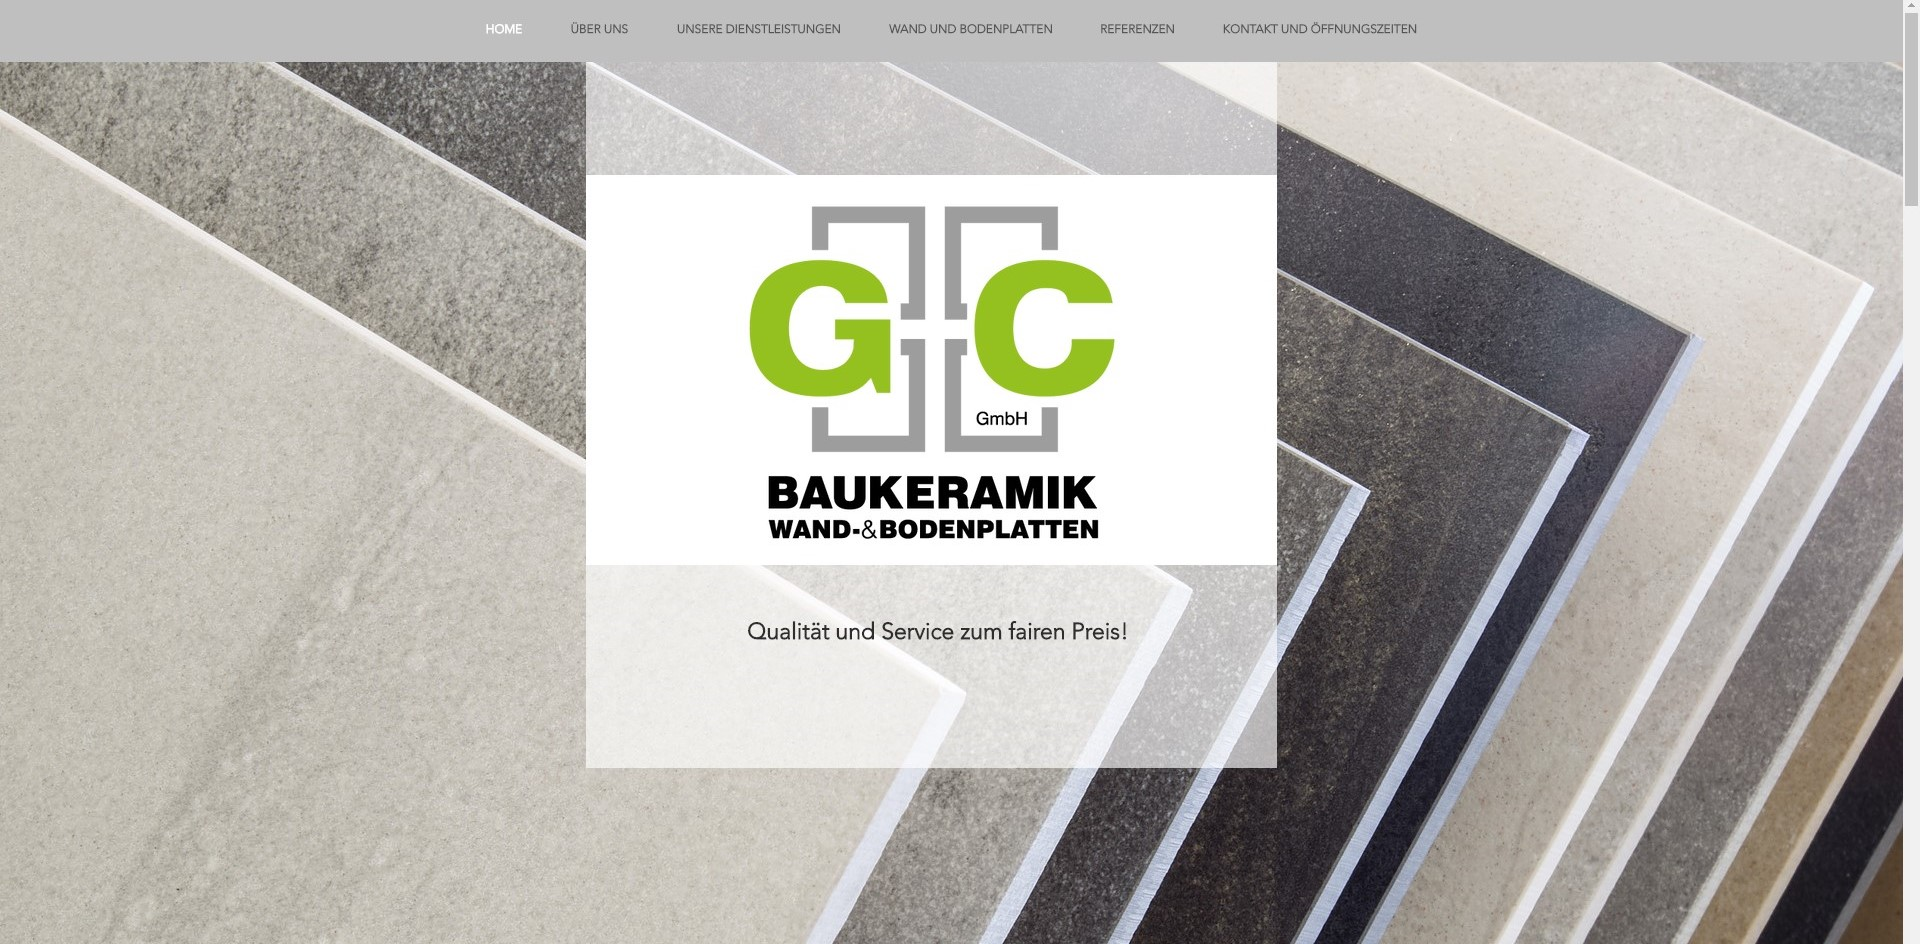 gc baukeramik aegerten webseite durch googplace